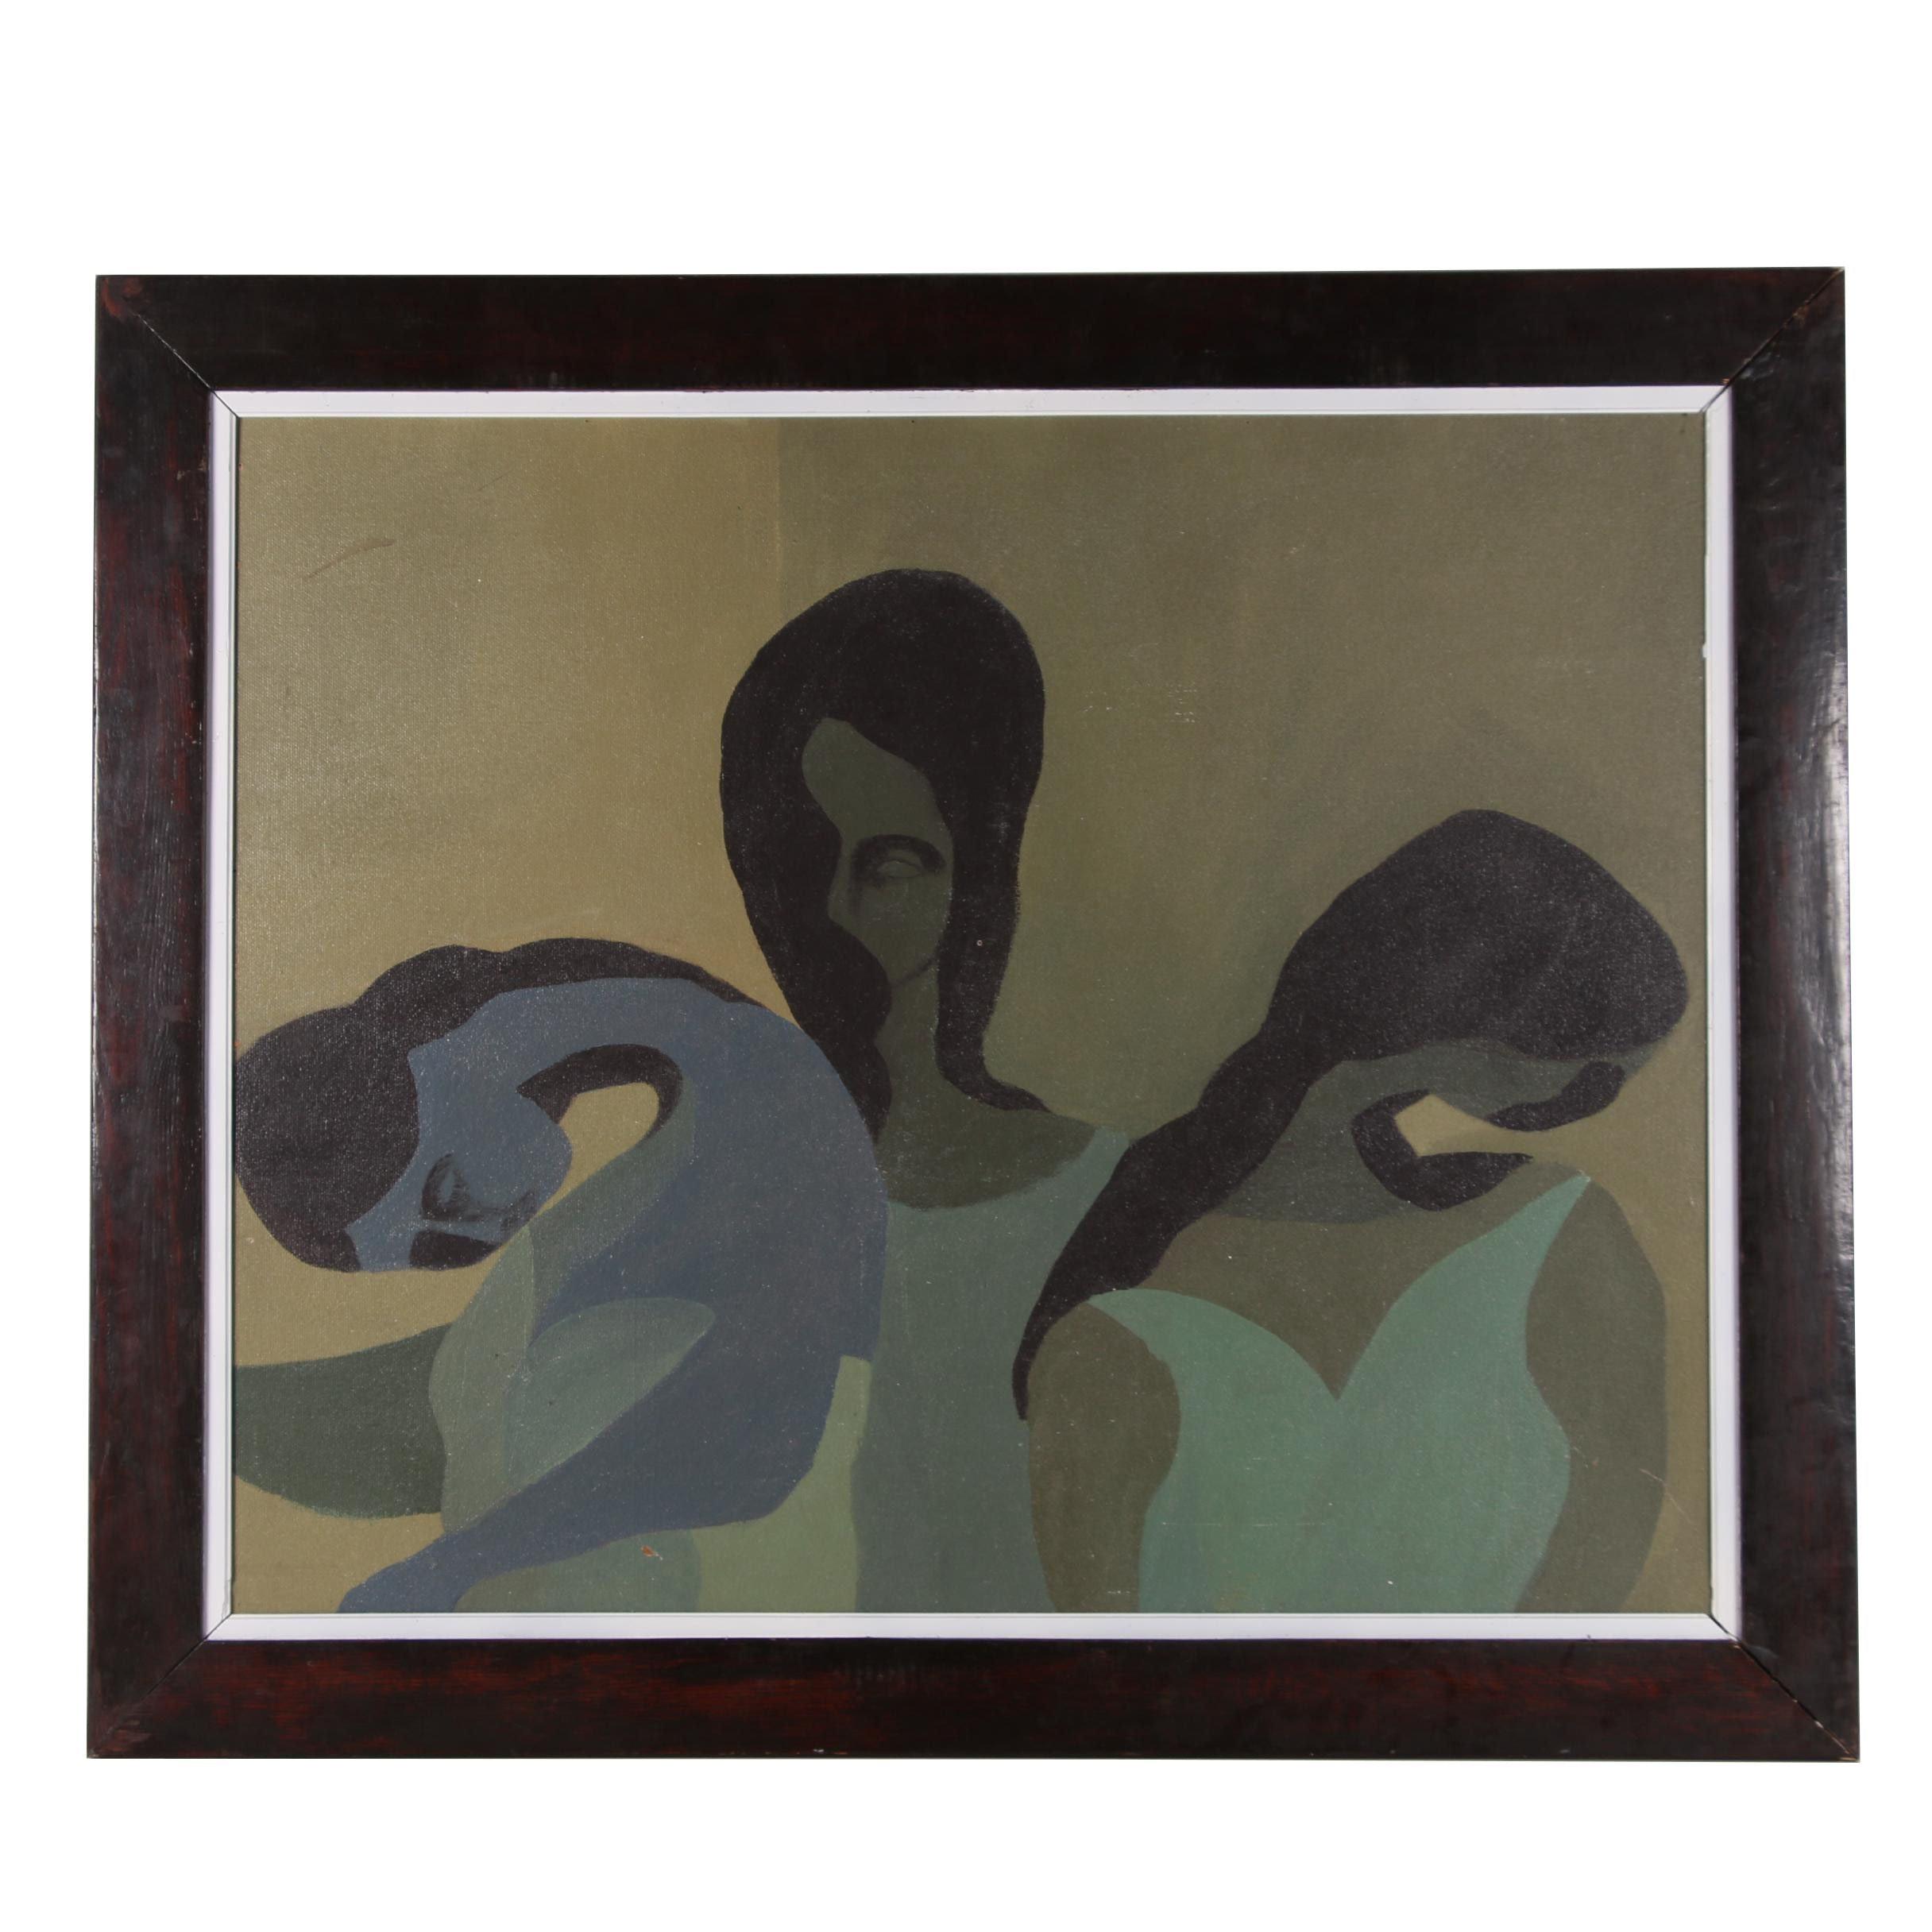 "Oscar Murillo Enamel Painting ""Figurative Image of 3 Women"""